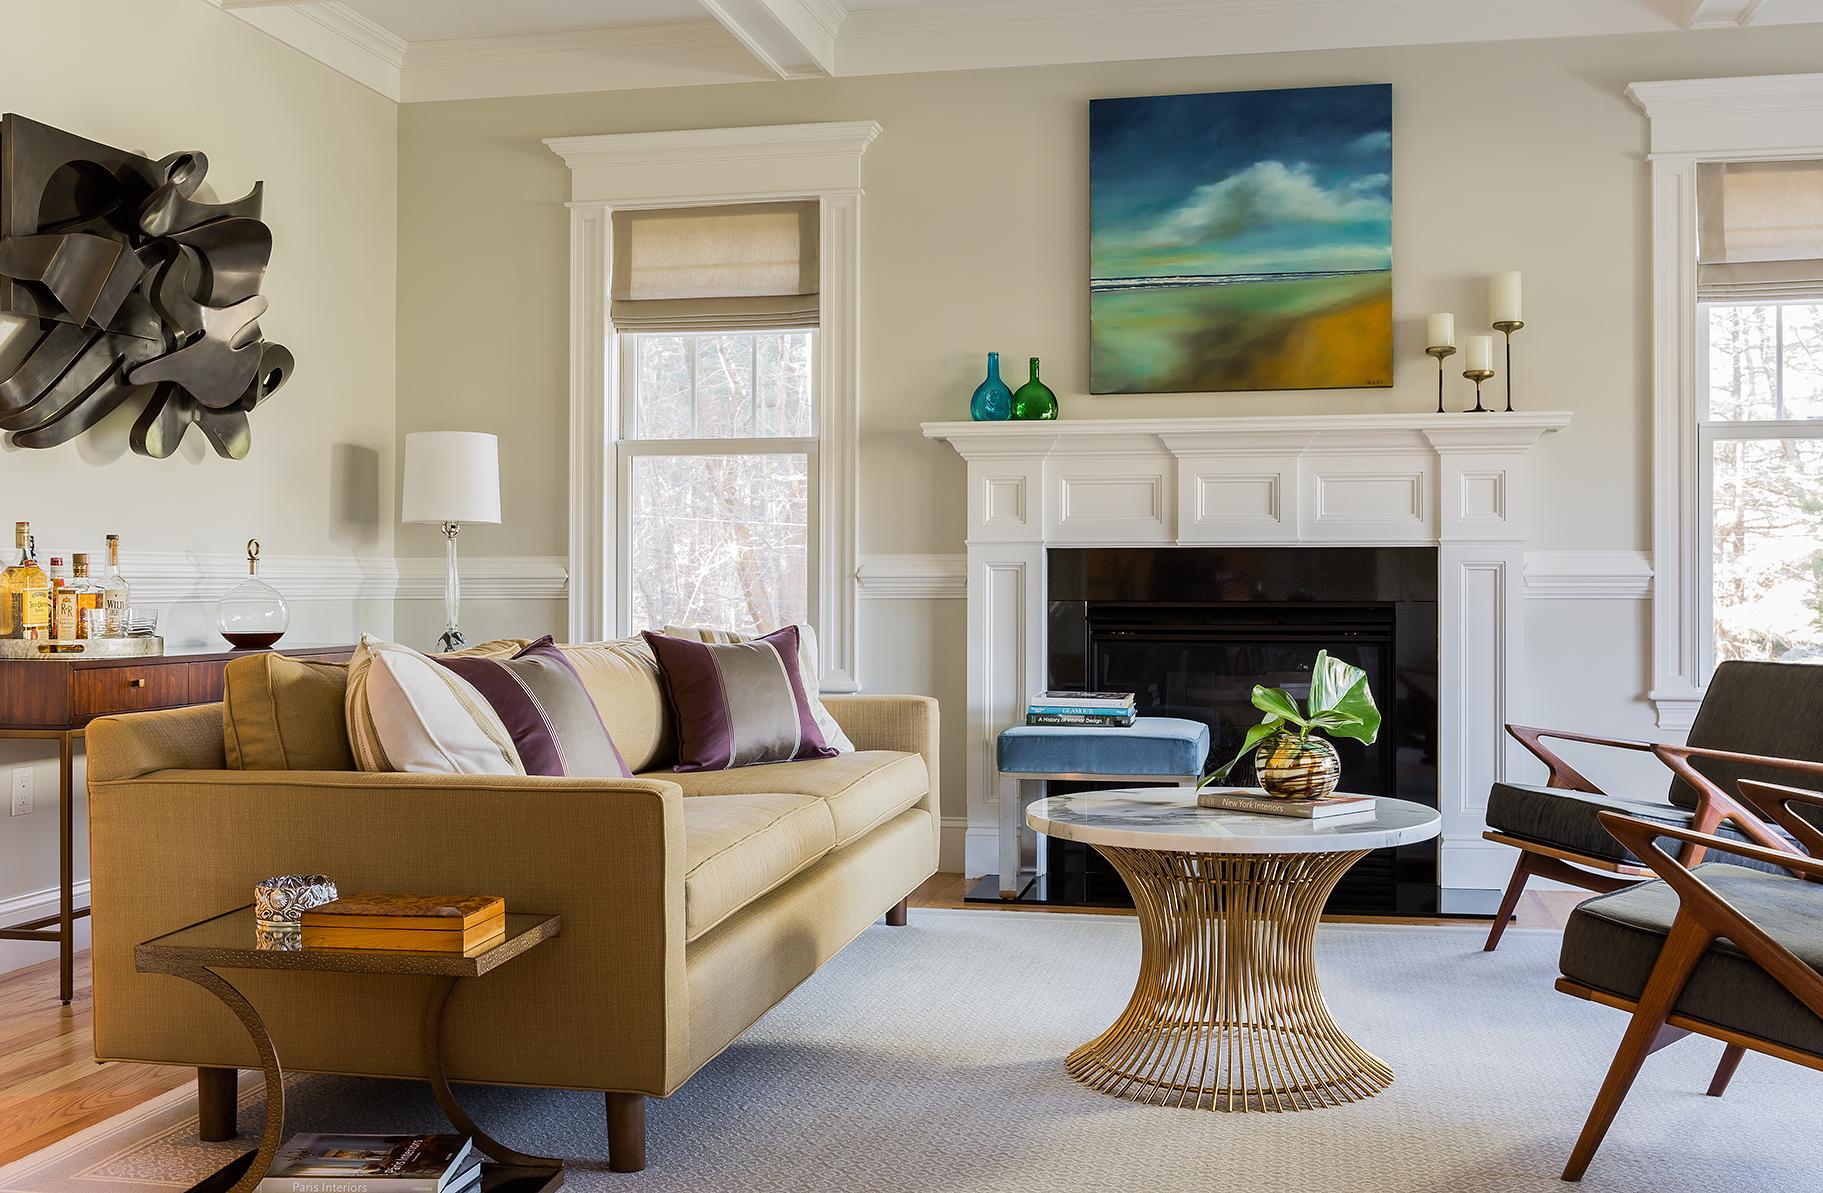 Eleven Interiors - Interior Design